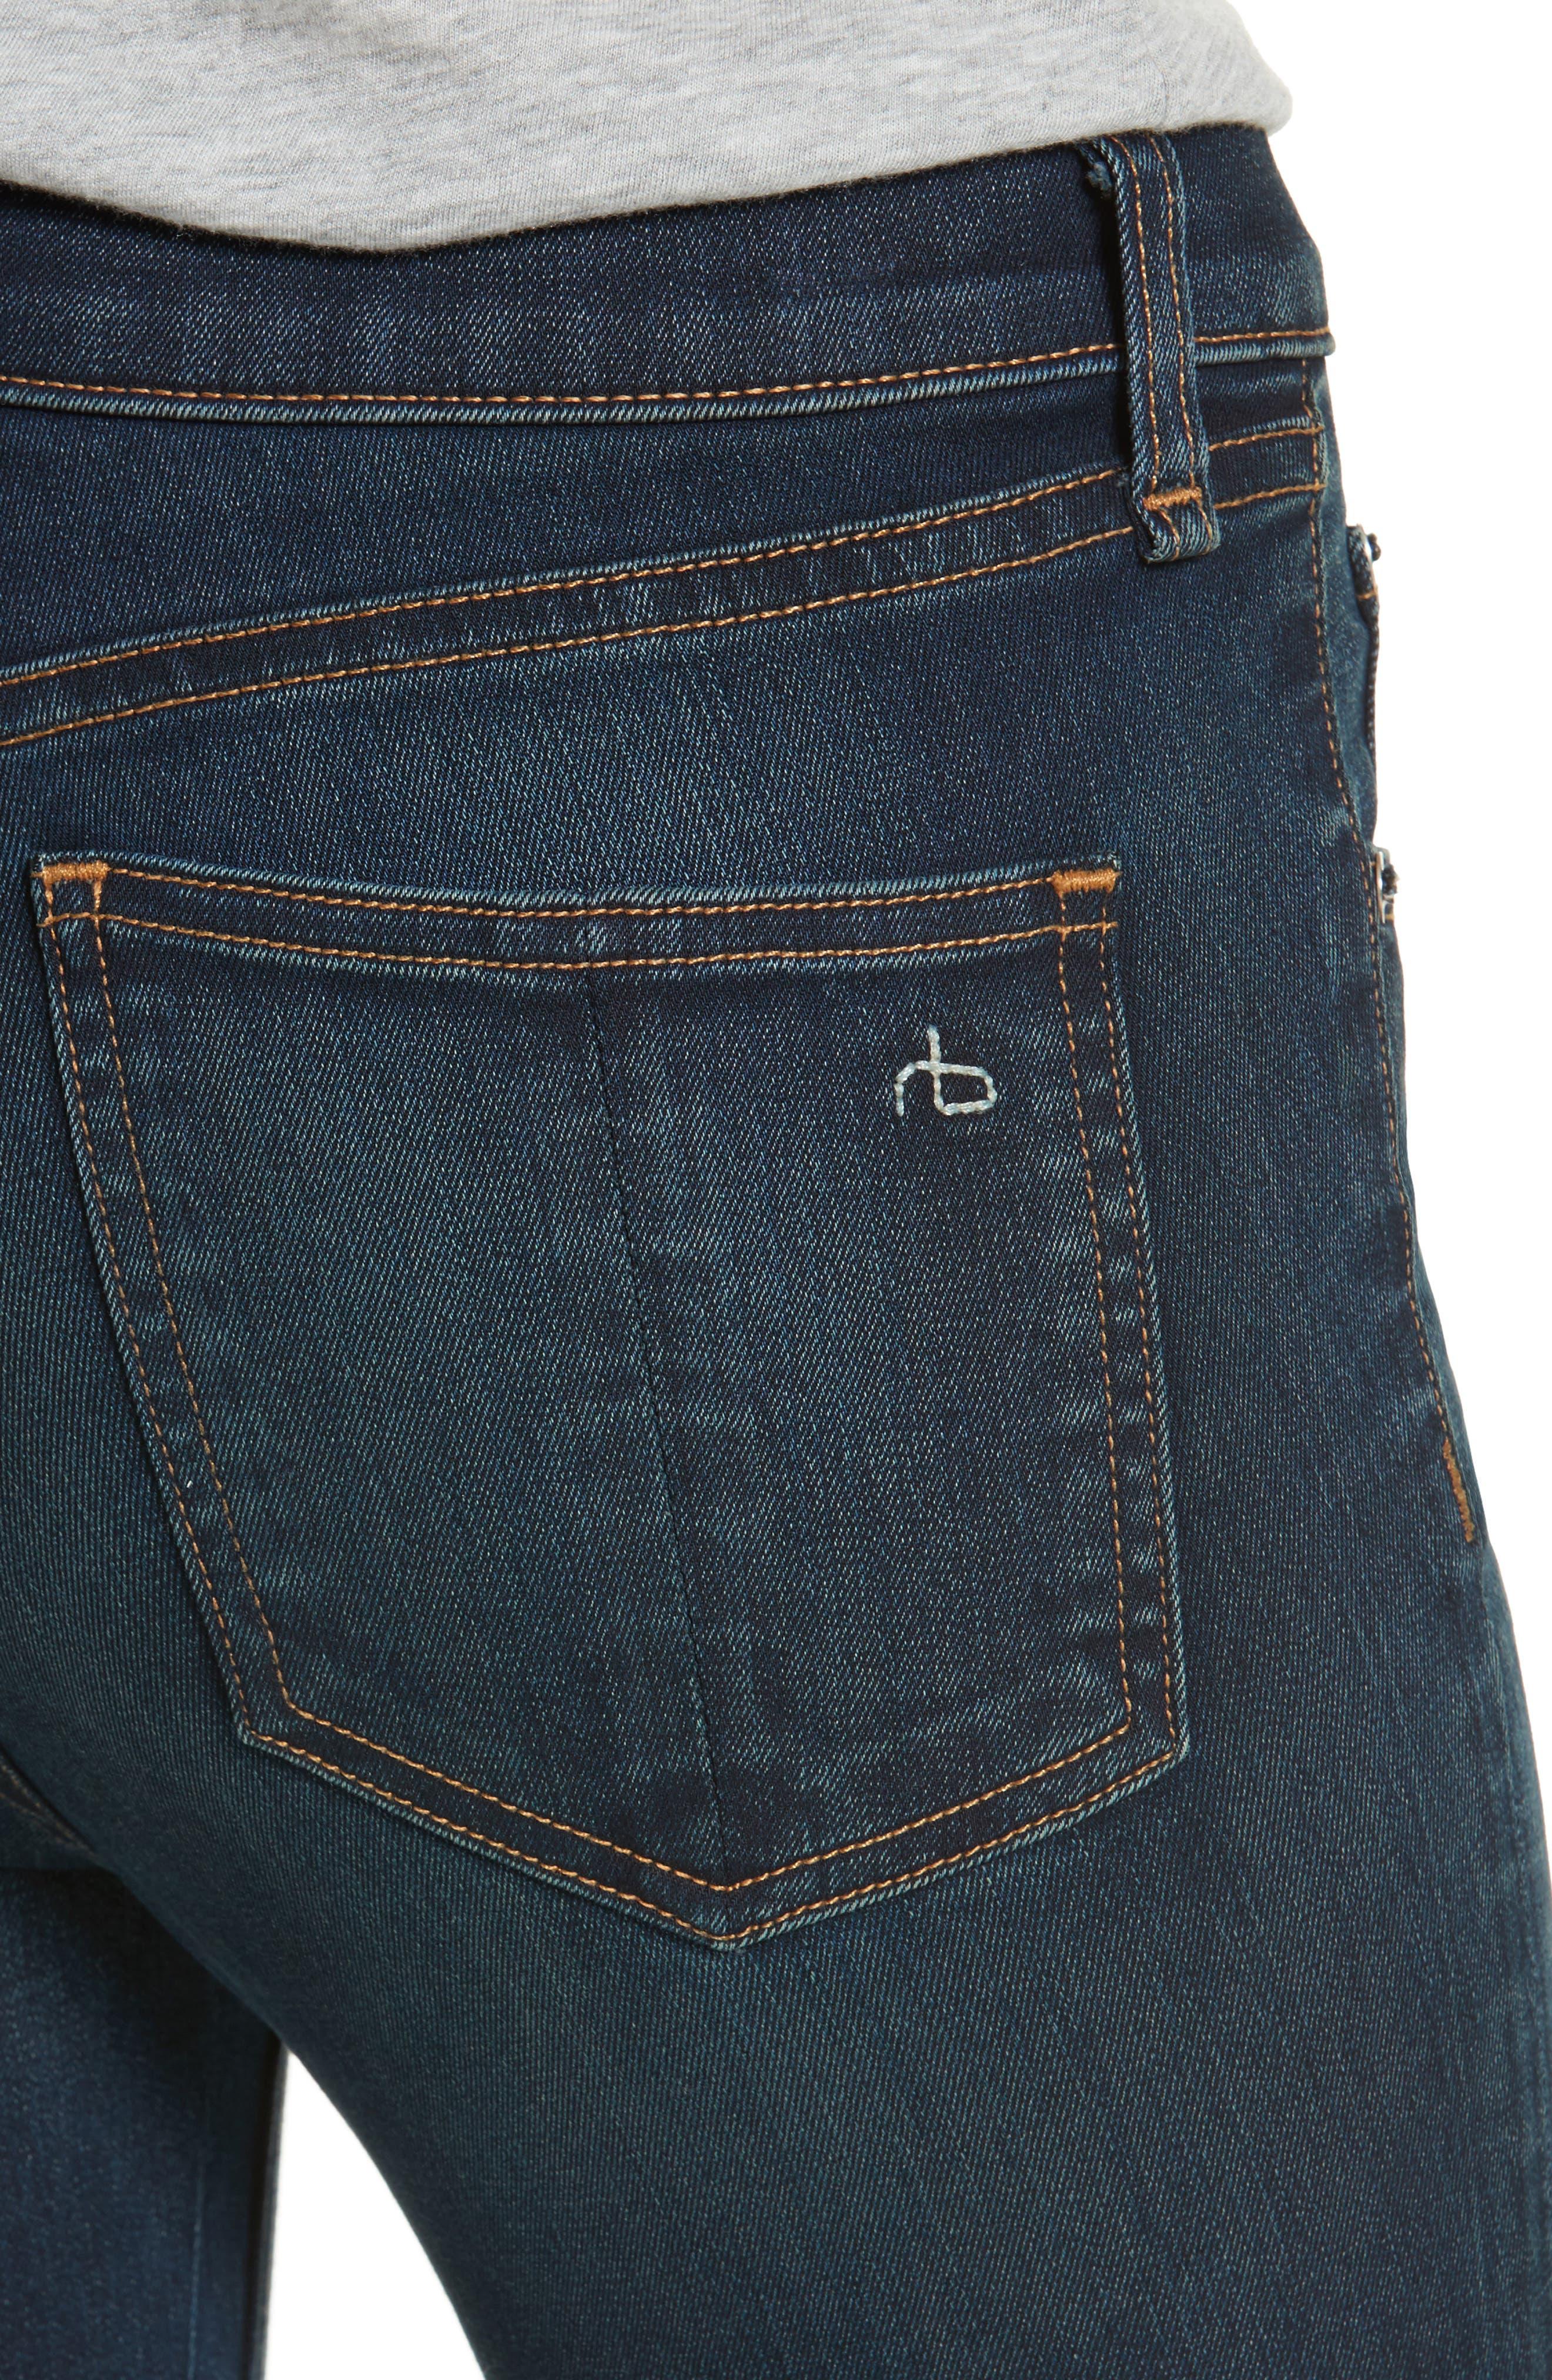 Hana High Waist Crop Flare Jeans,                             Alternate thumbnail 4, color,                             421